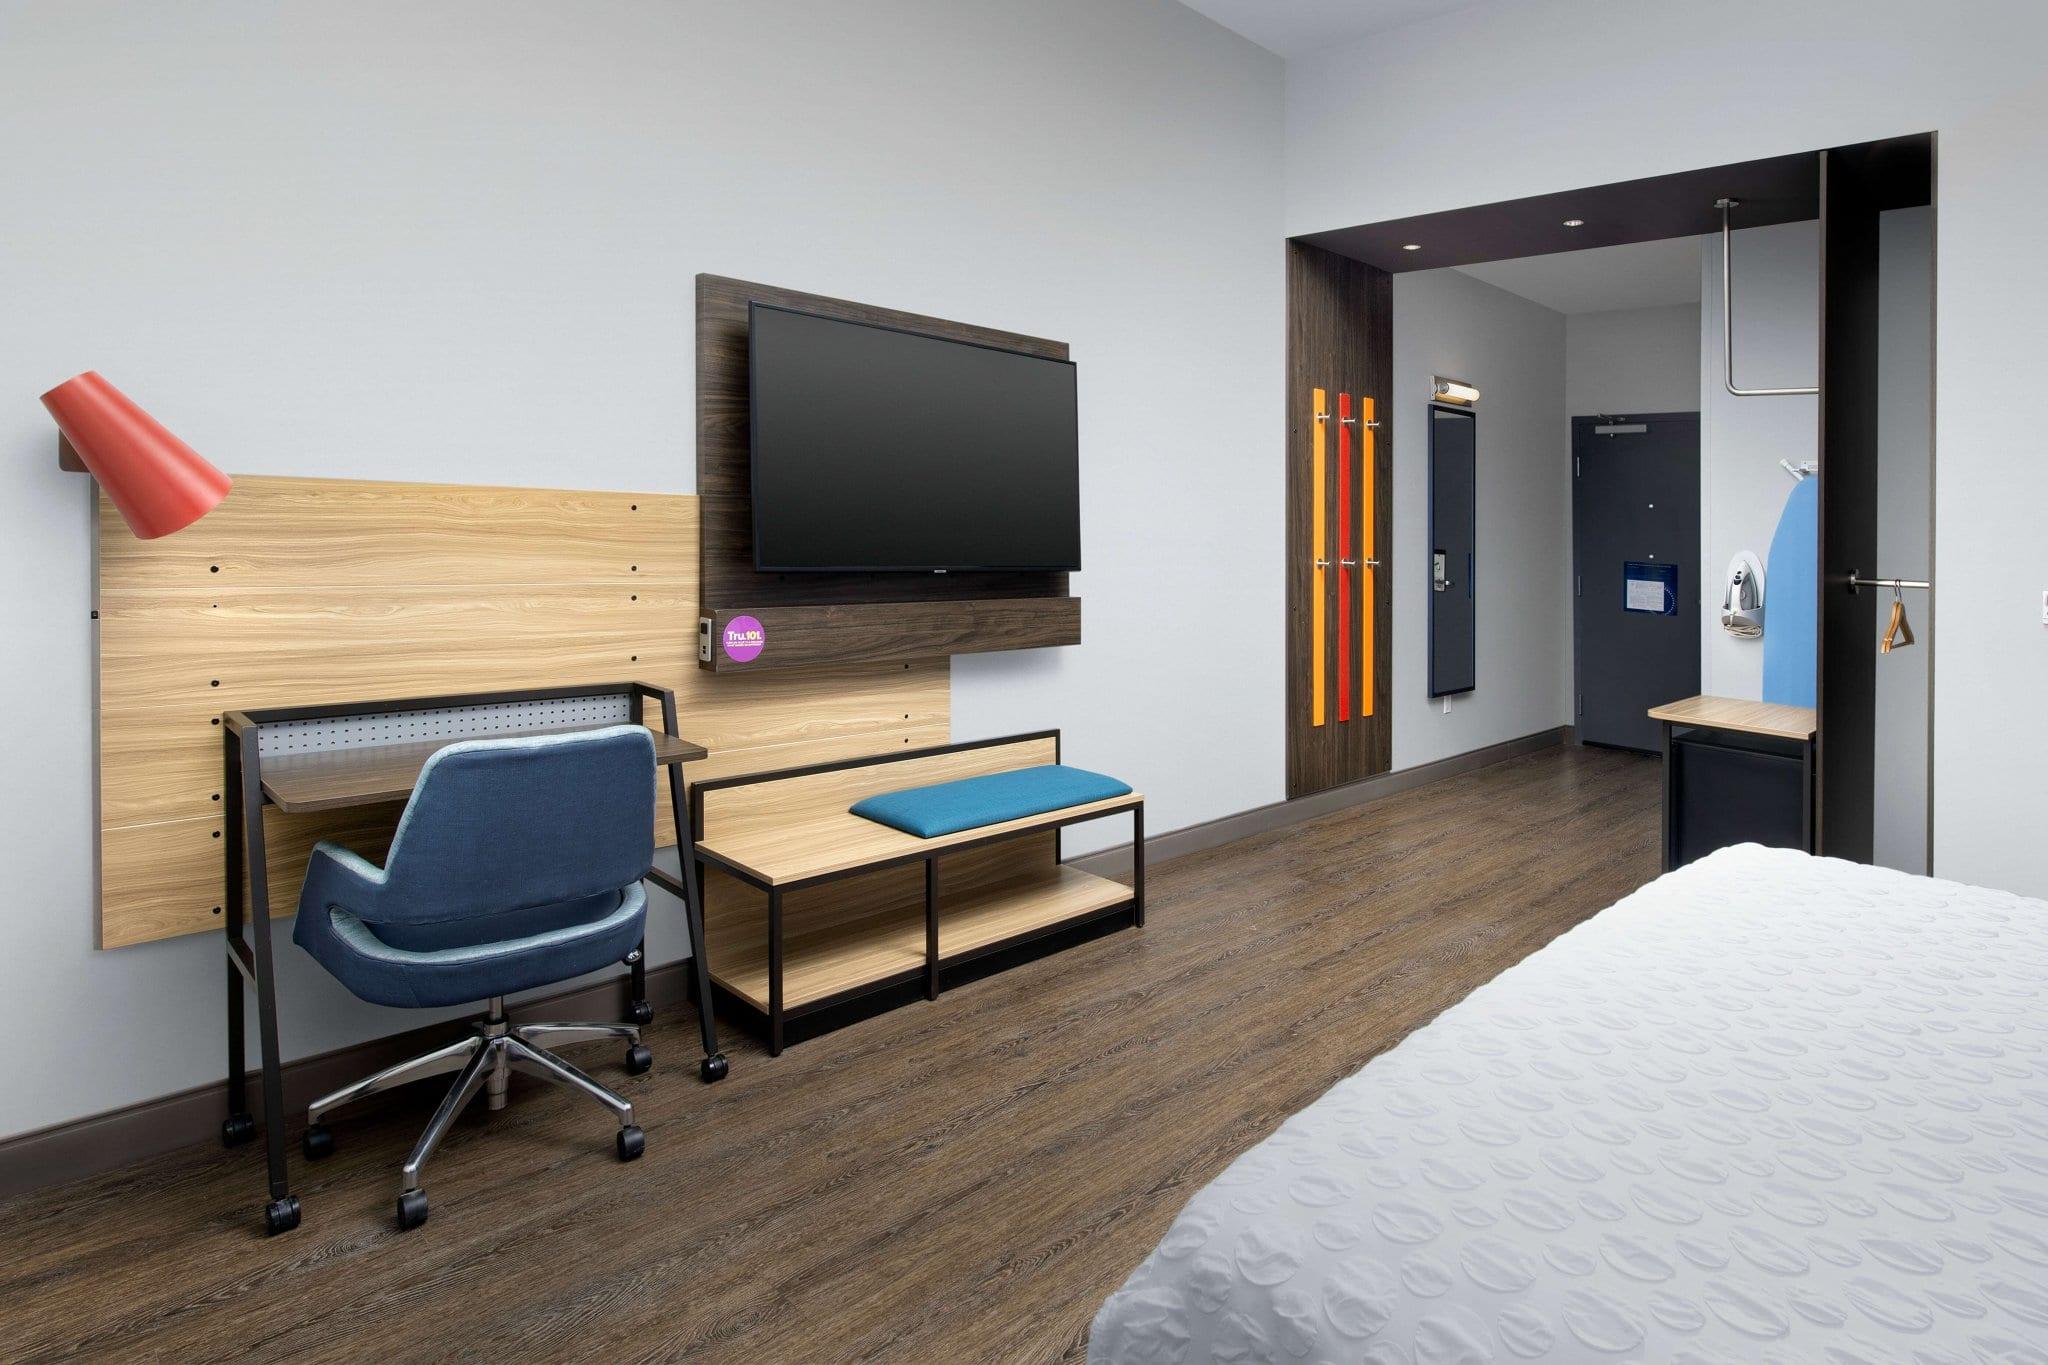 Tru by Hilton San Antonio Lackland/Seaworld